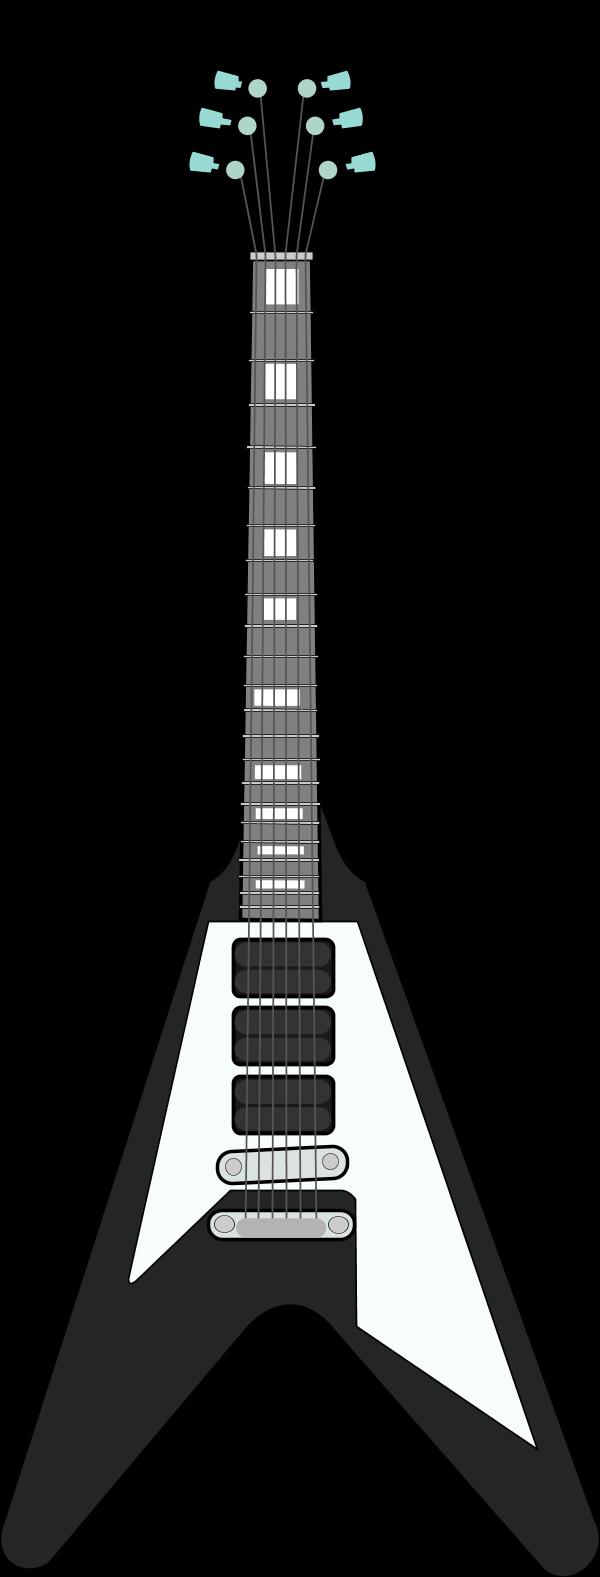 Guitar  black and white black and white guitar clipart clipartwiz 2 2